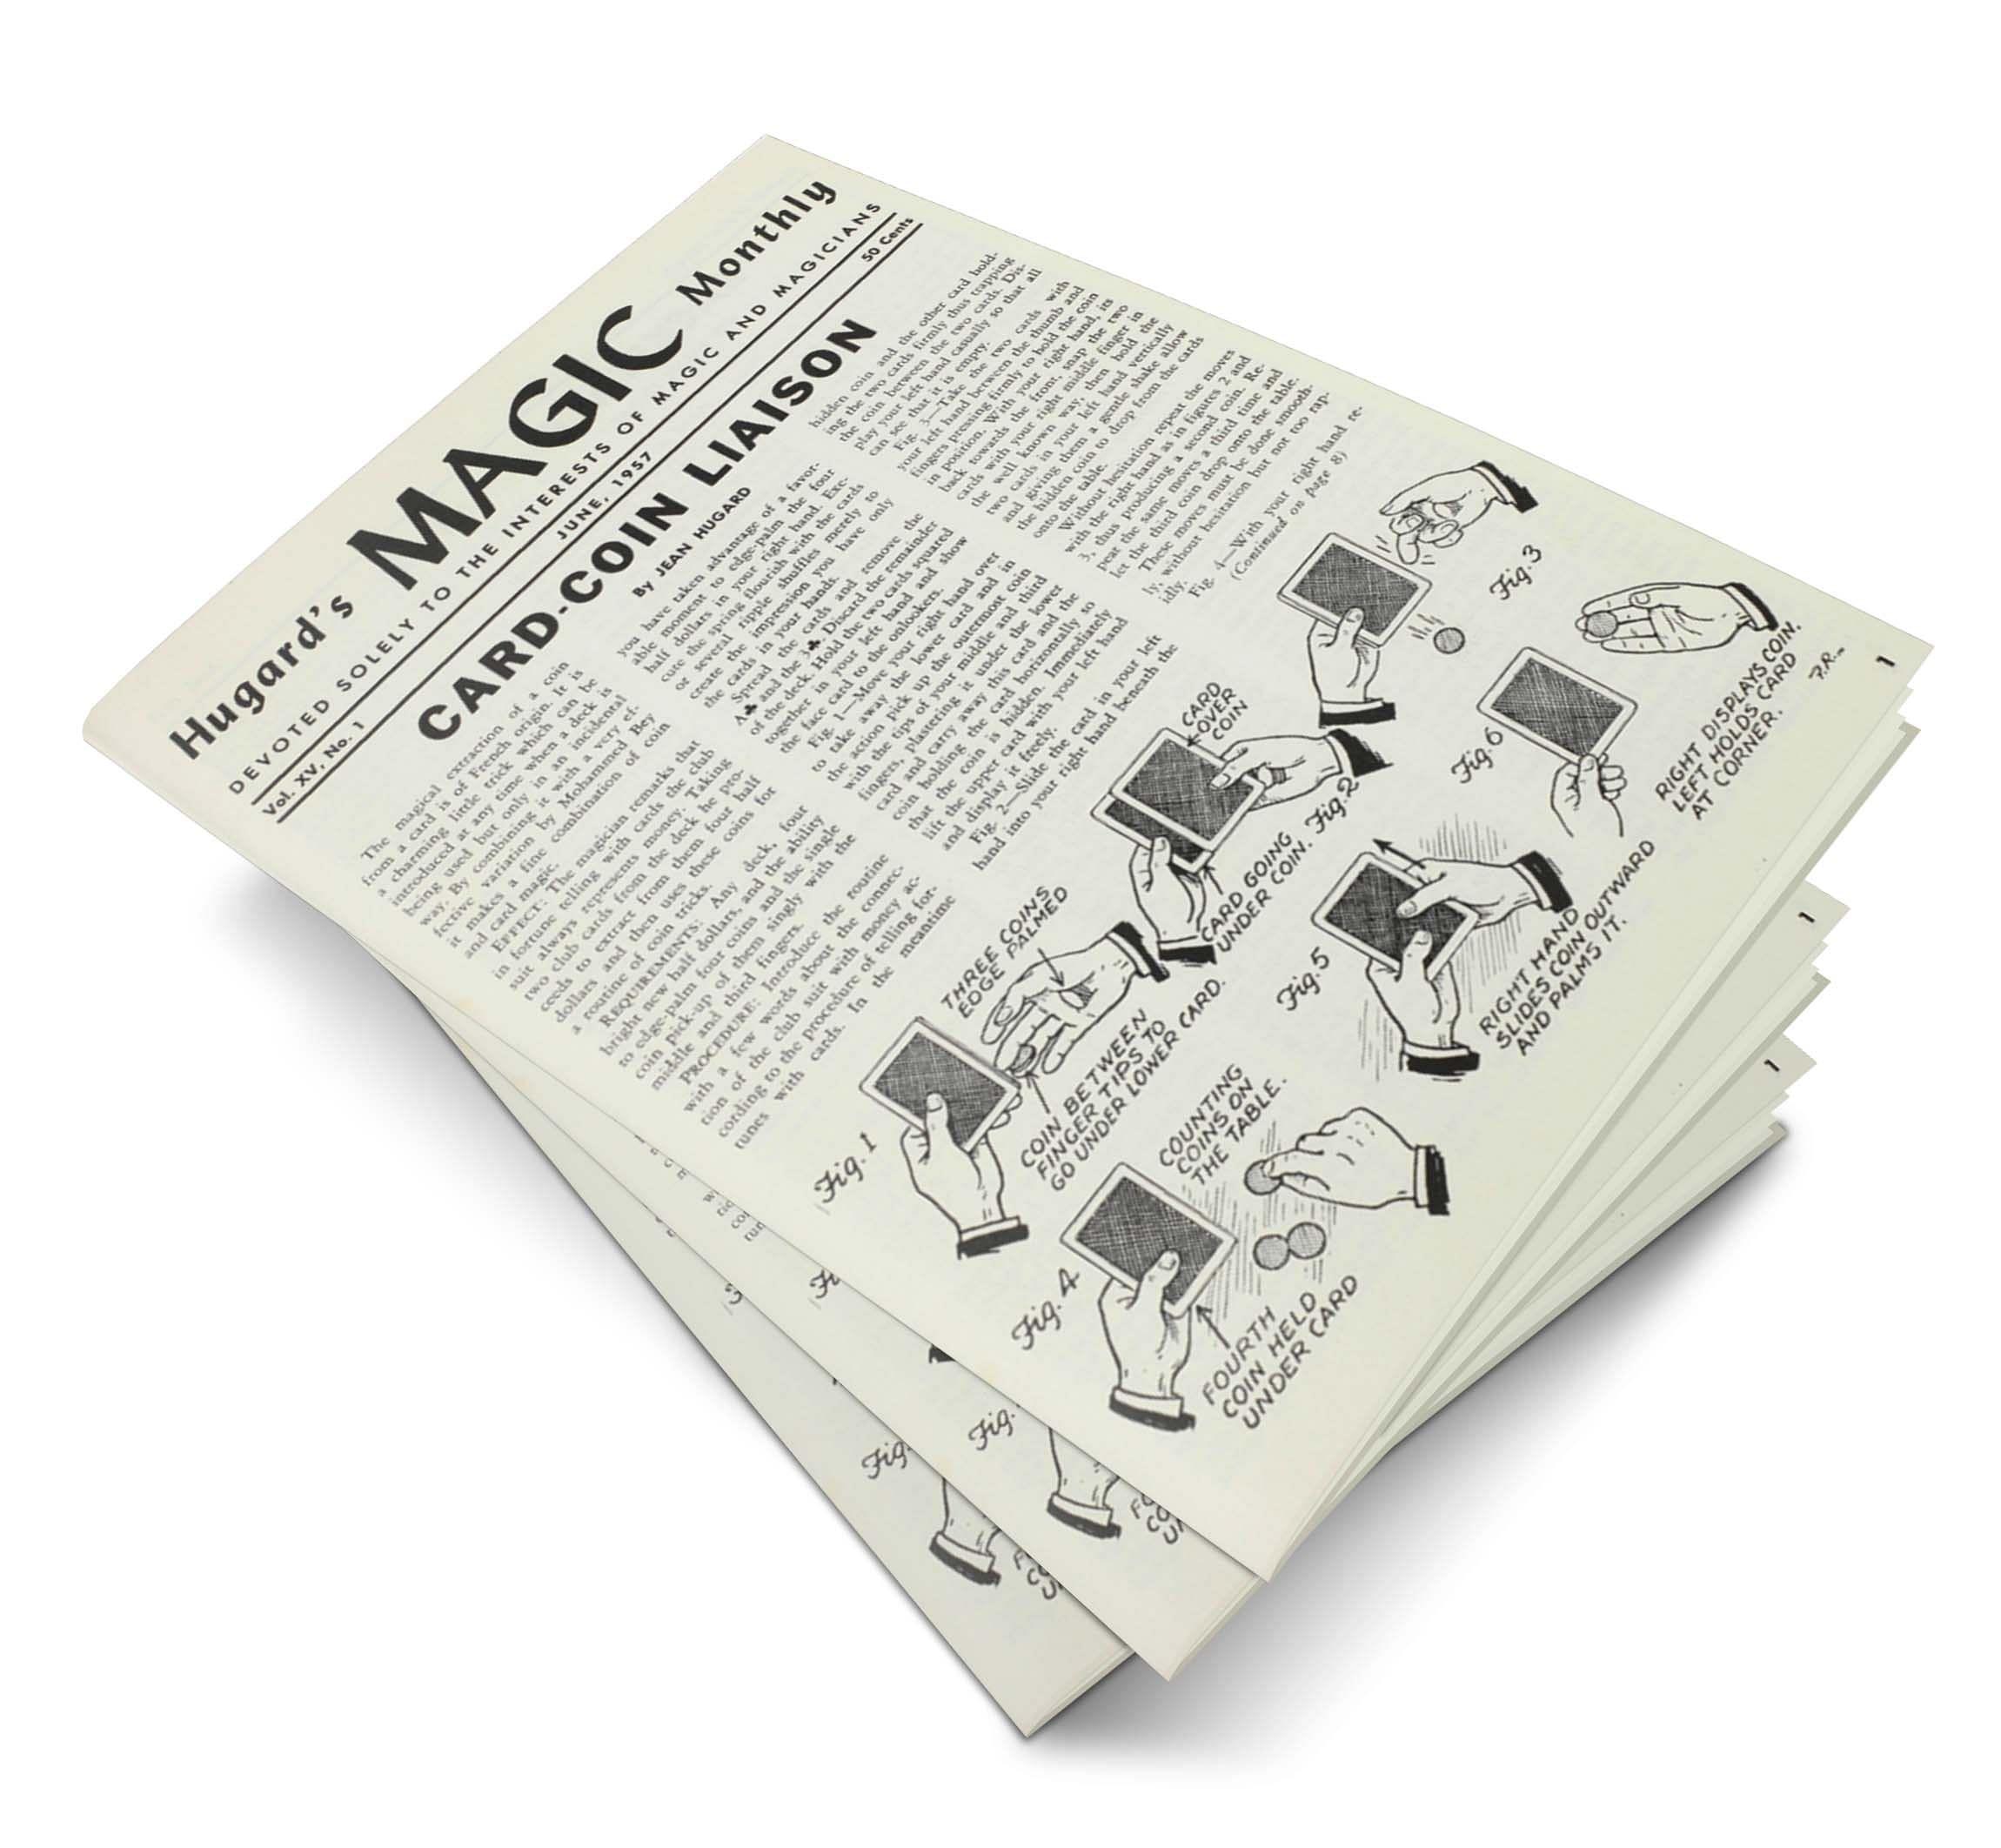 Hugard's Magic Monthly Volume 15 - magic